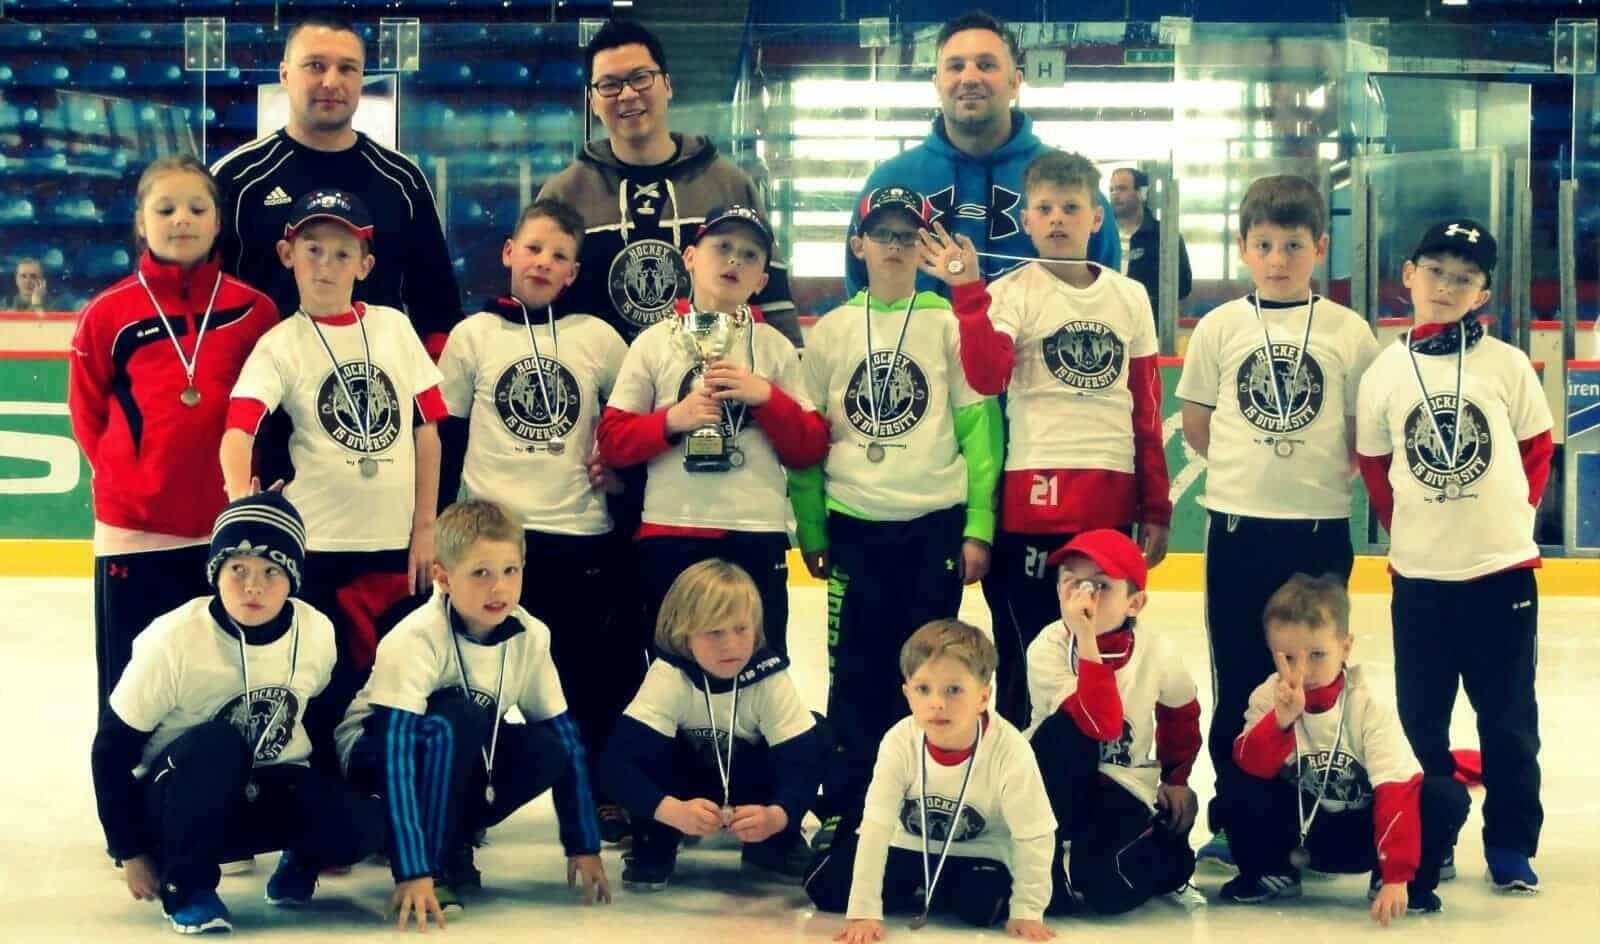 Hockey is Diversity